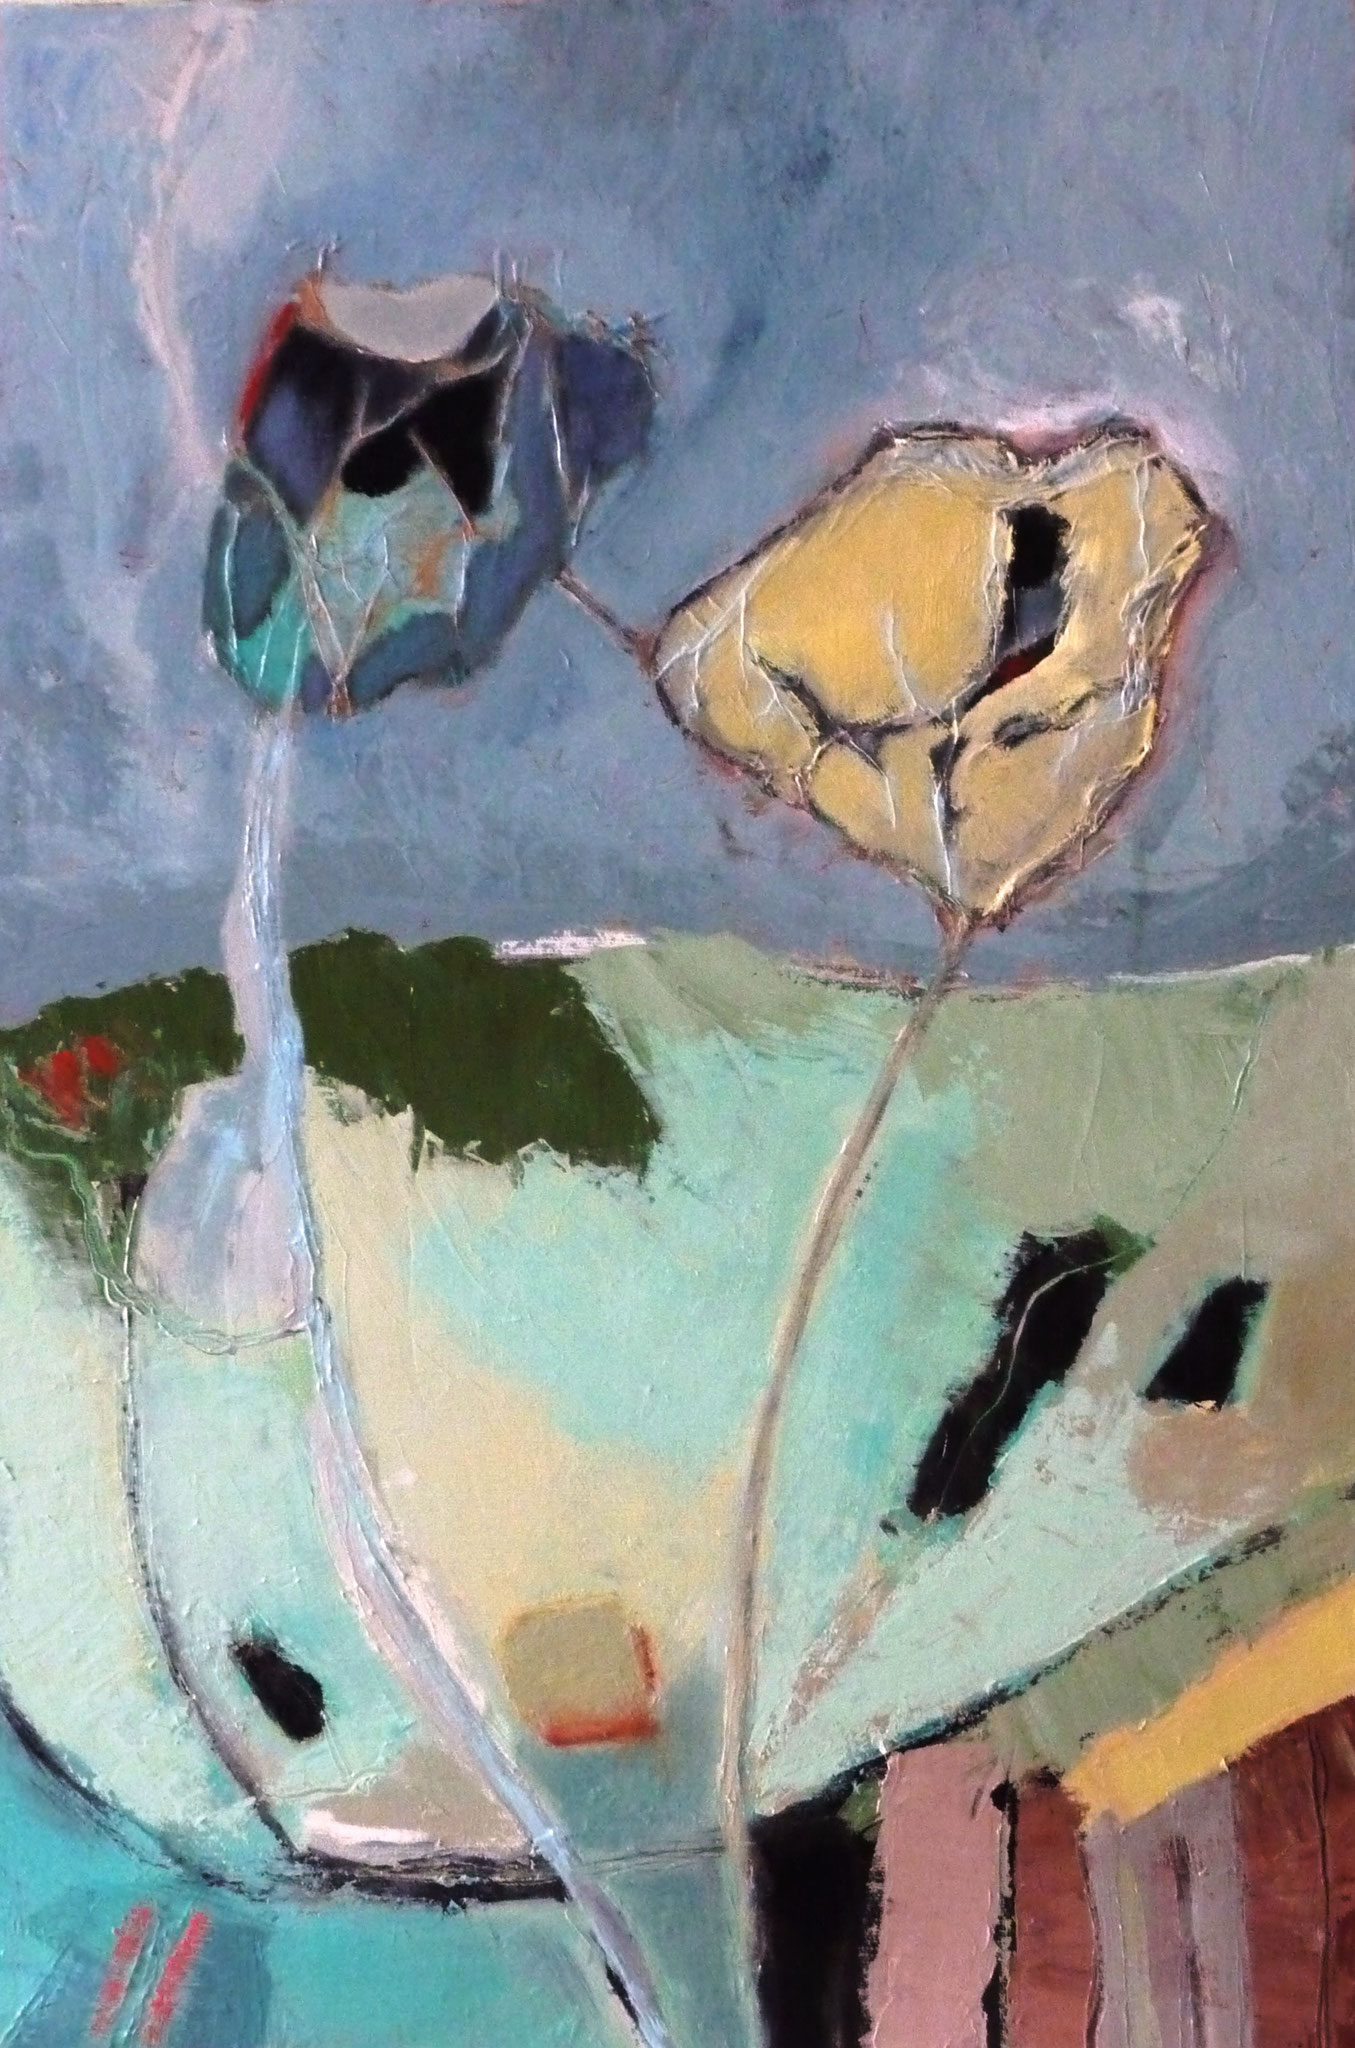 Wandering   ---   2012 - Acrylique - 60 x 45 cm